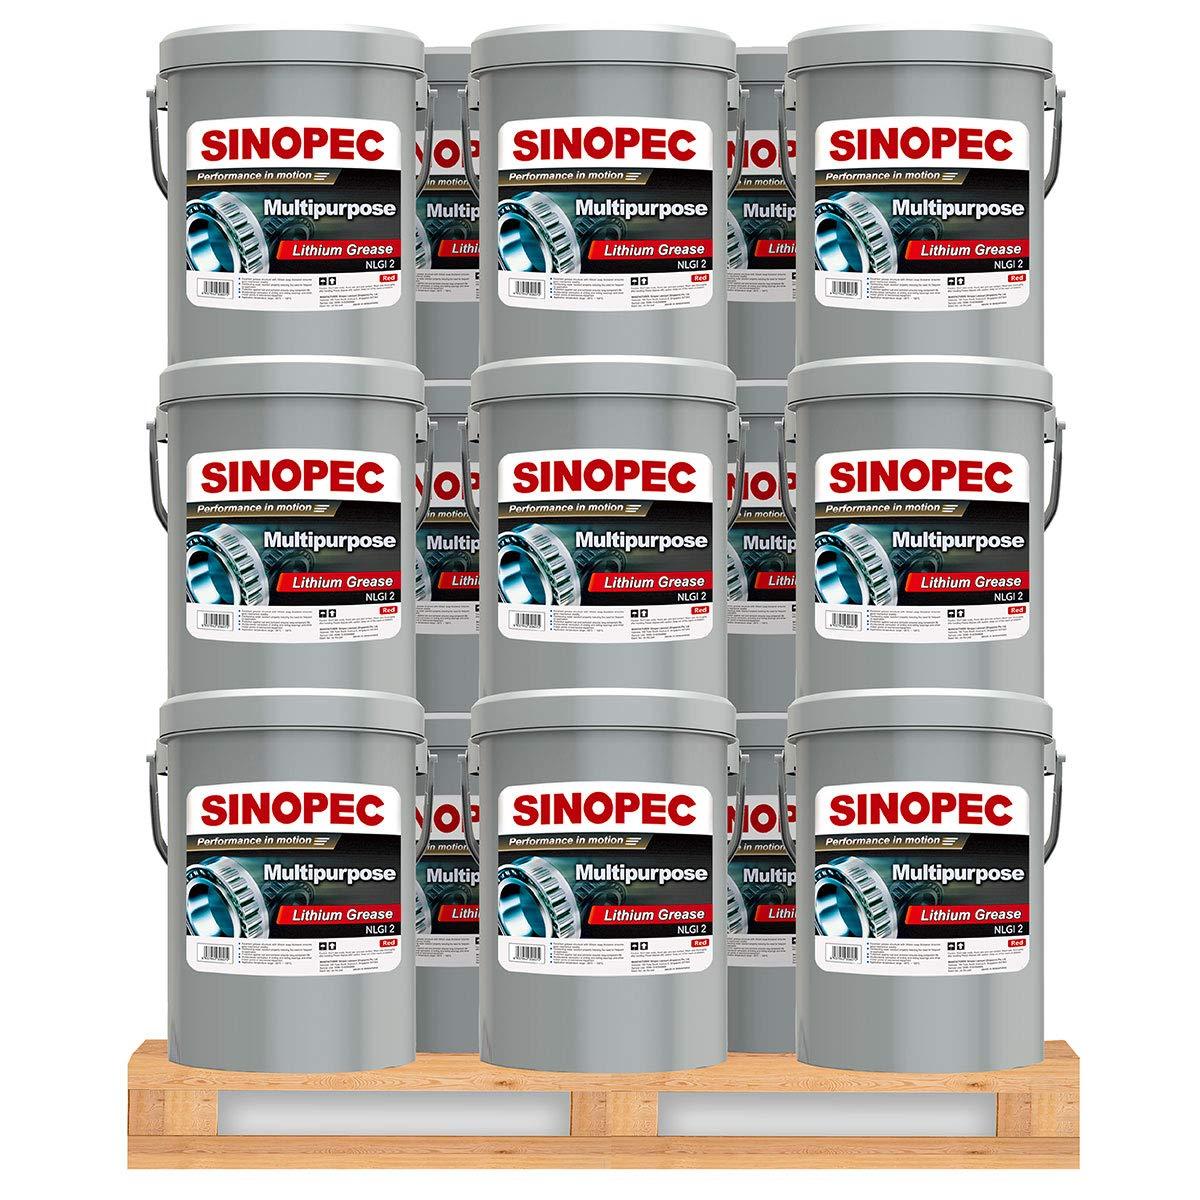 Sinopec Red Multipurpose Lithium Grease #2-35LB. (5 Gallon) Pail (36)